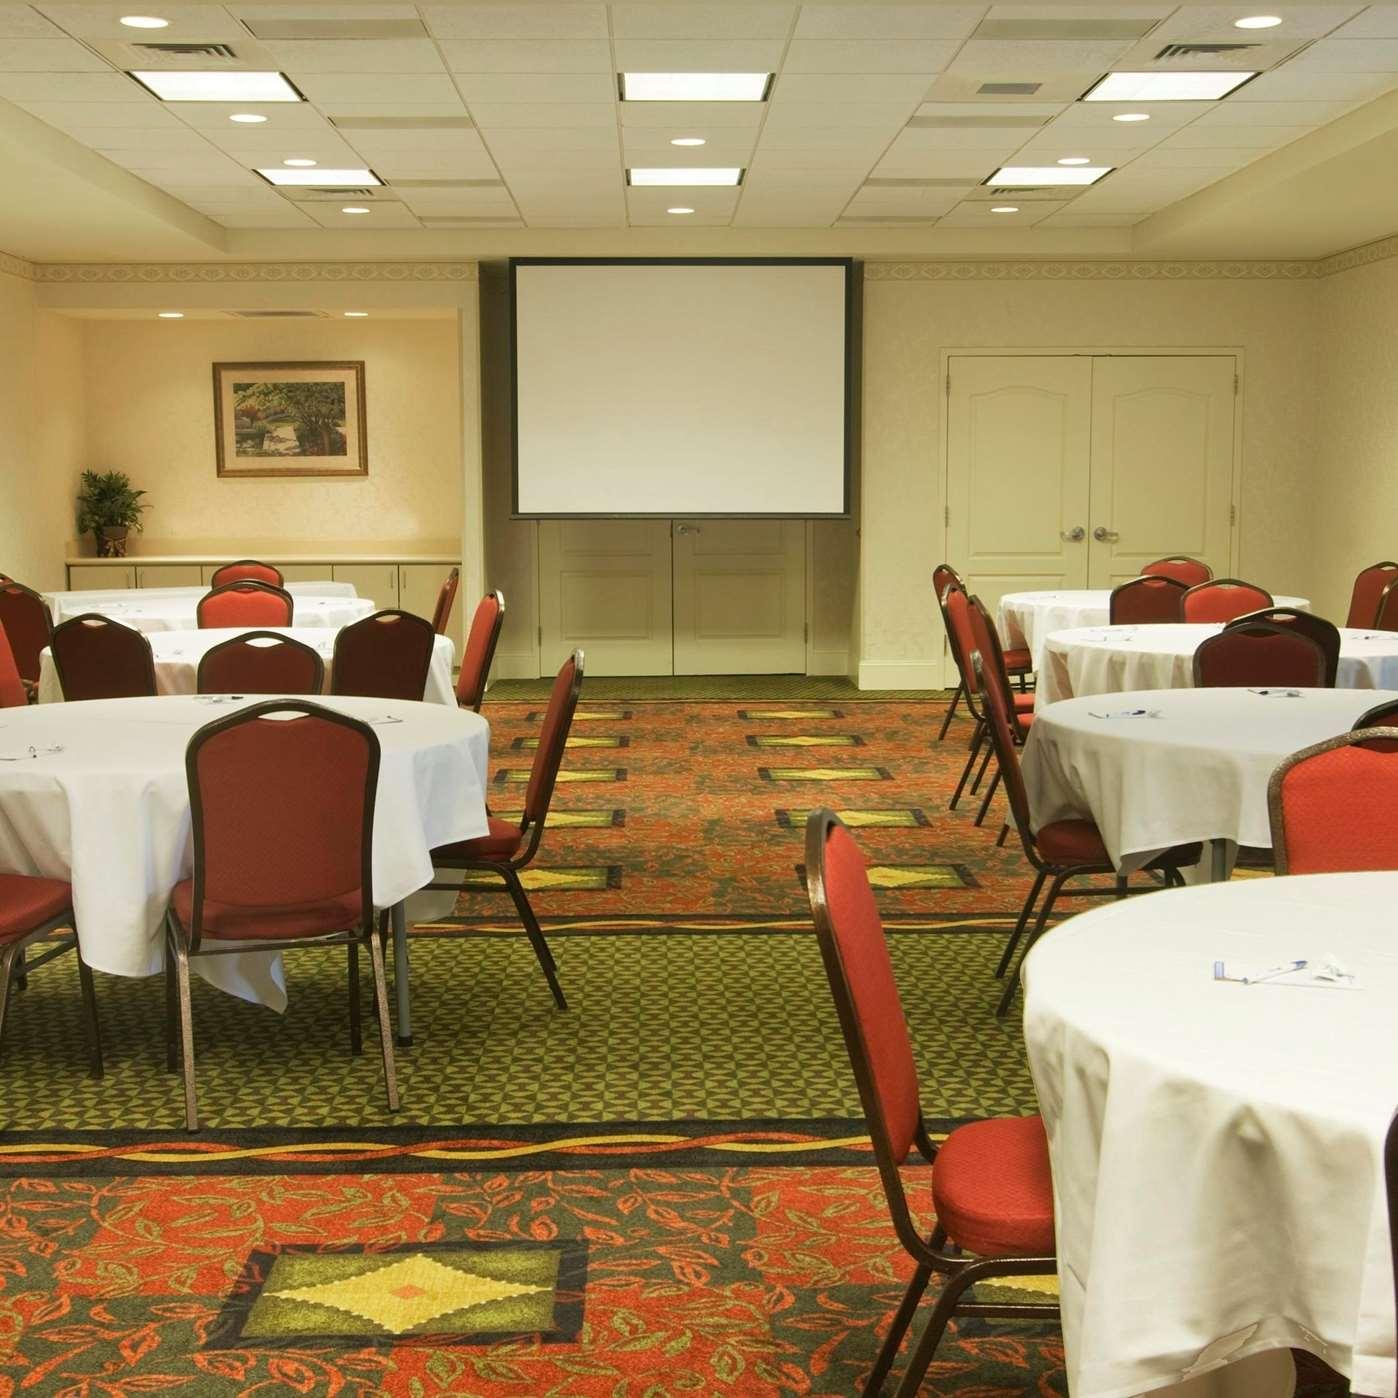 hilton garden inn knoxville westcedar bluff 216 peregrine way knoxville tn hotels motels mapquest - Hilton Garden Inn Knoxville